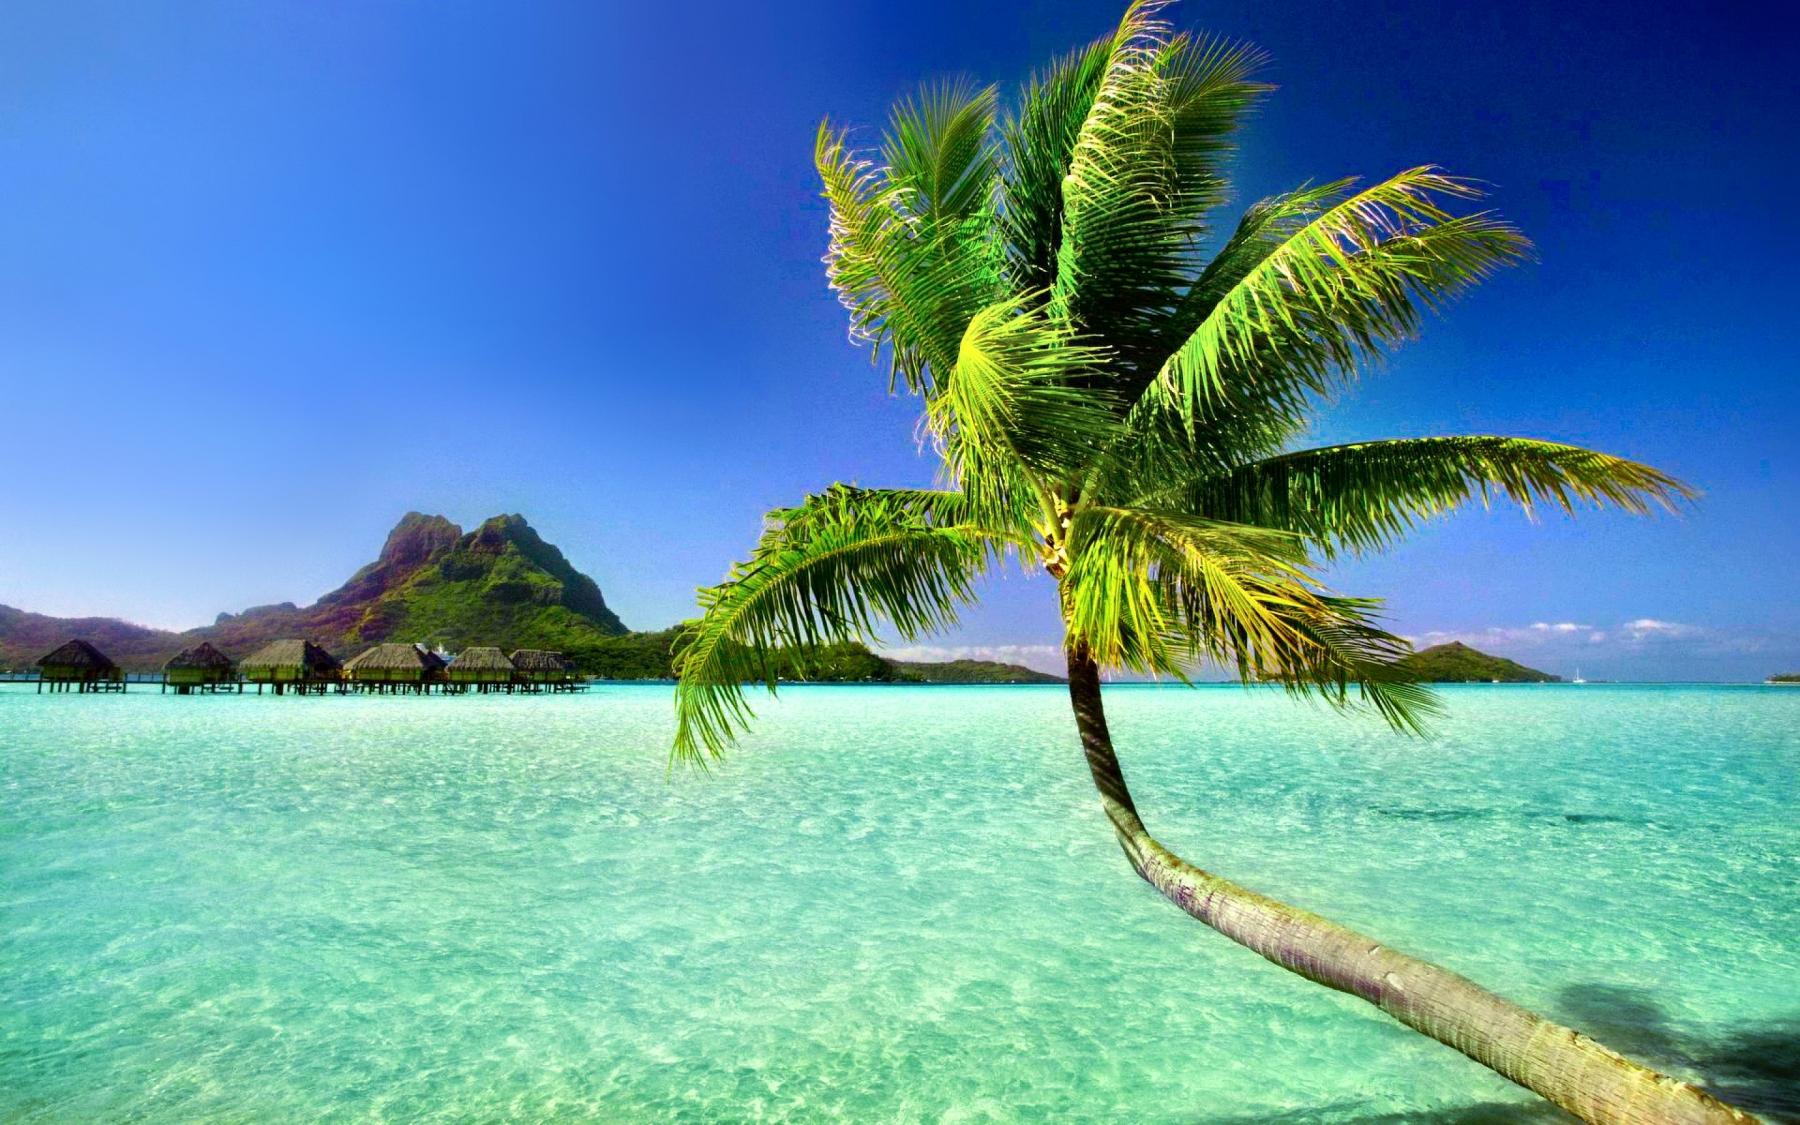 Beach Tropical HD Wallpaper Background